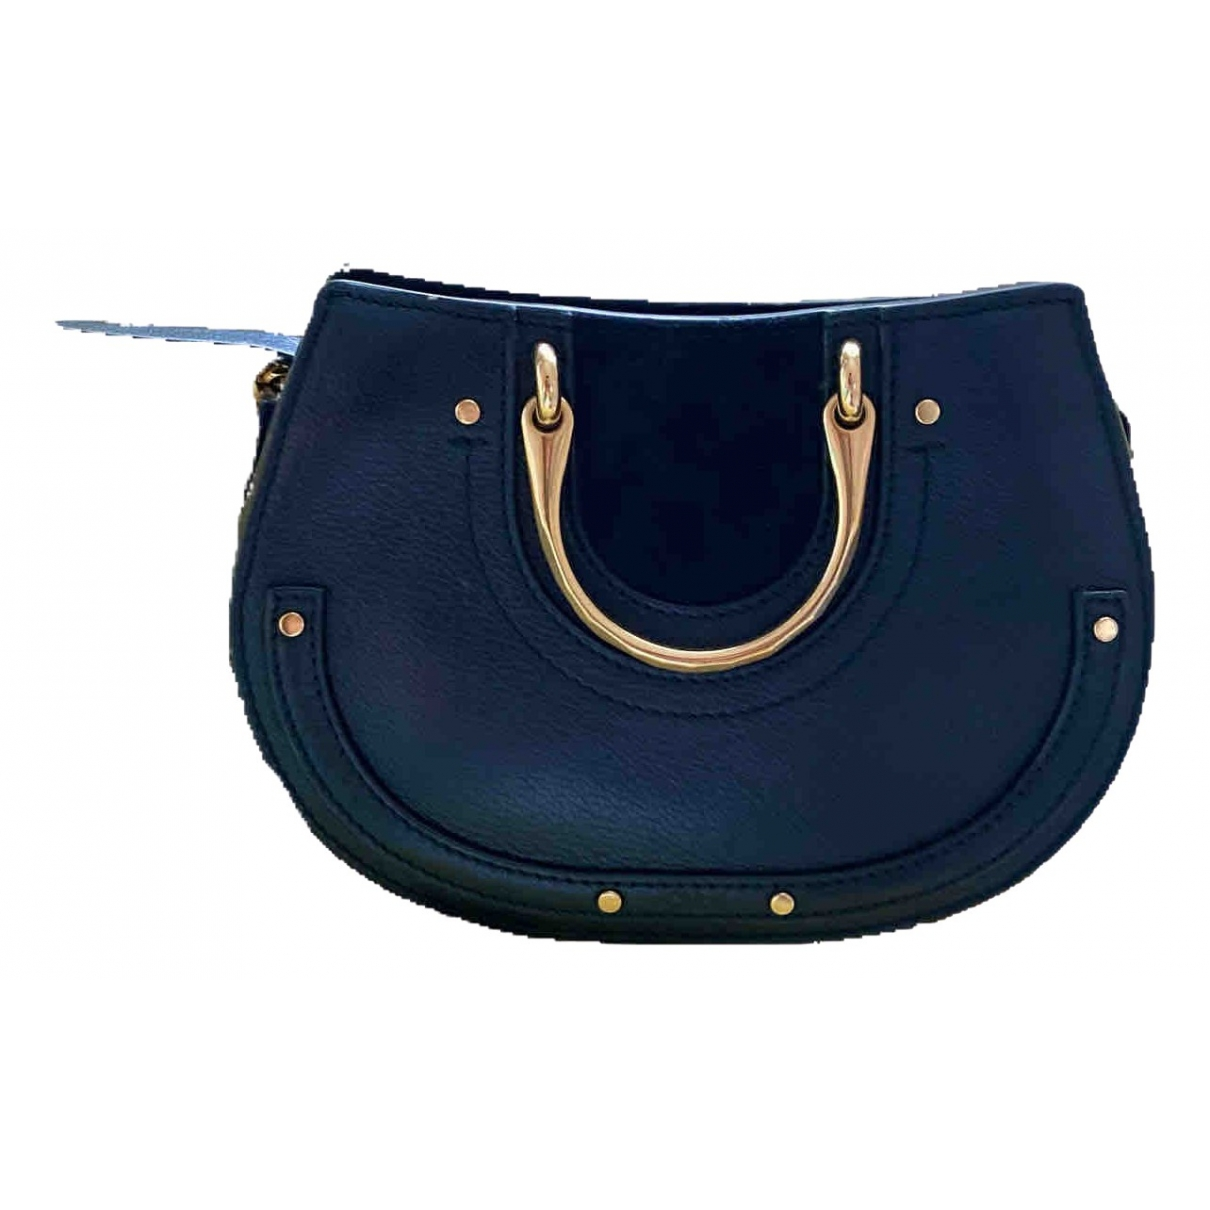 Chloe Pixie Handtasche in  Blau Leder